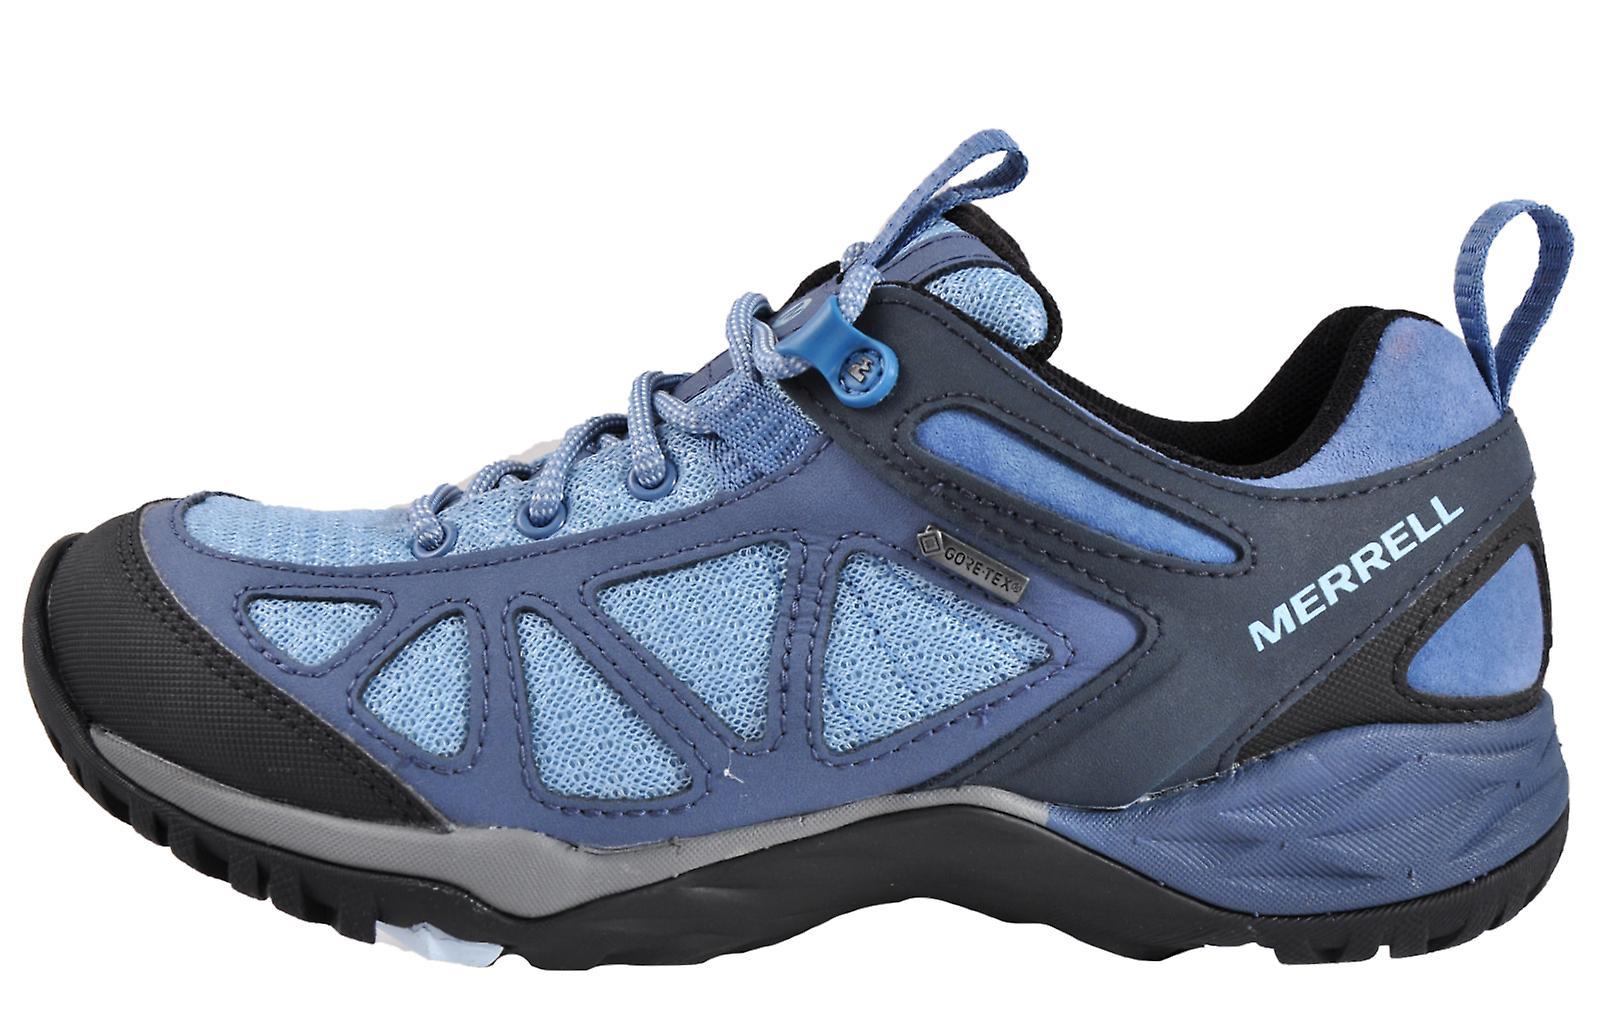 Merrell Siren Sport GTX Gore-Tex Waterproof Blue